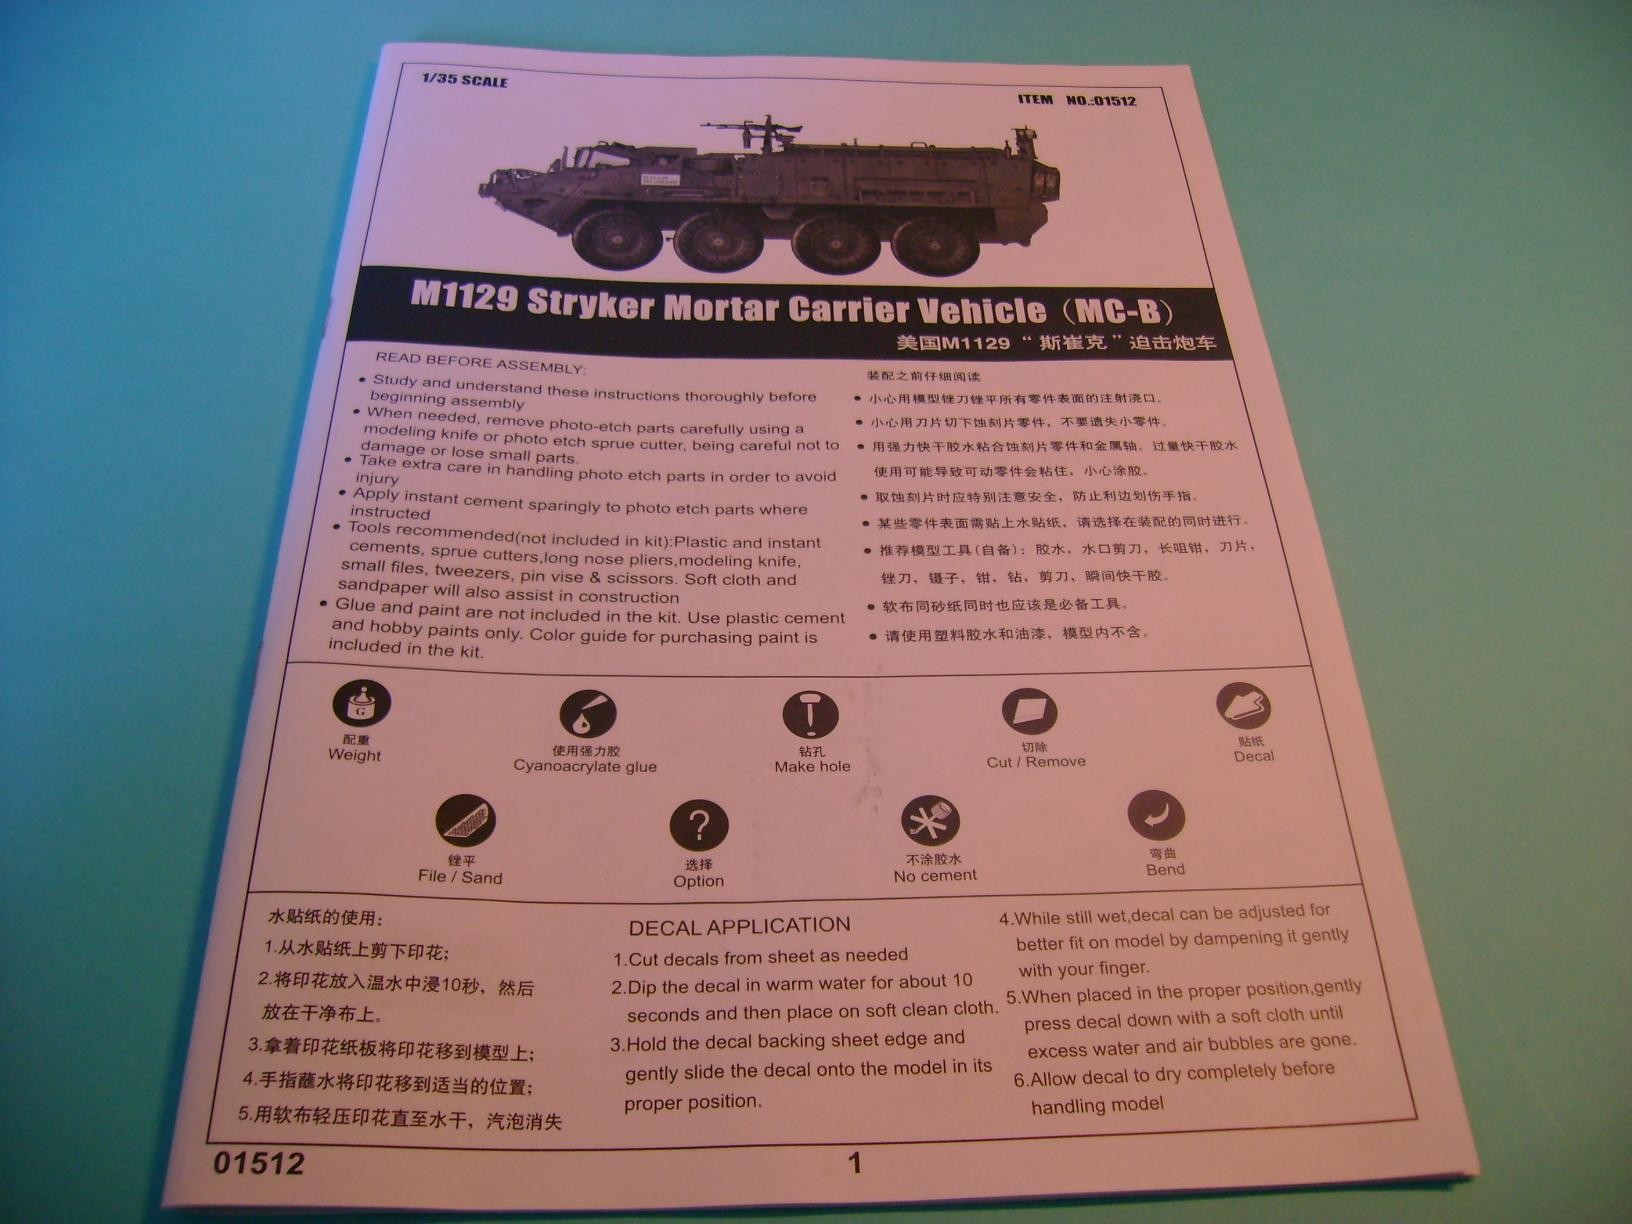 Review Kit M1129 Stryker Mortar Carrier Vehicle MC-B Trumpeter 1/35... Dsc02230g